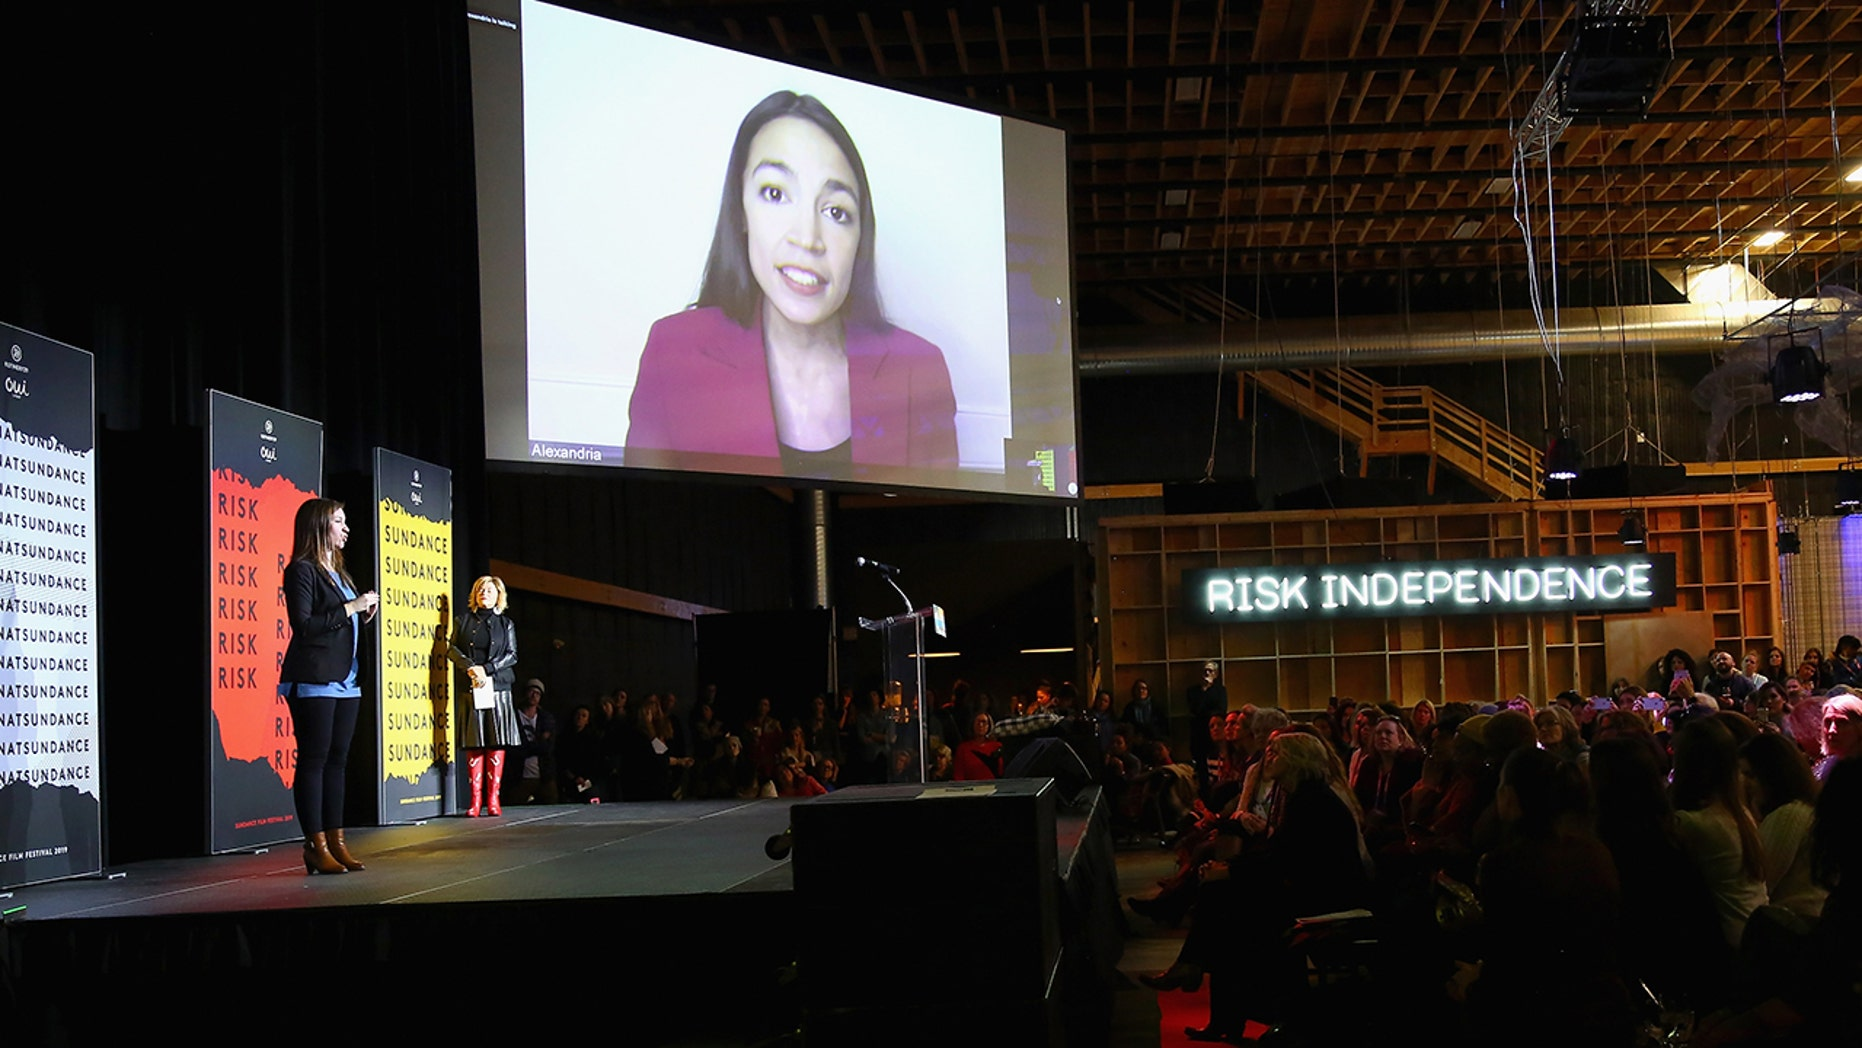 U.S. Representative Alexandria Ocasio-Cortez speaks via video at the Women At Sundance Celebration Hosted By Sundance. (Photo by Suzi Pratt/Getty Images for Refinery29)